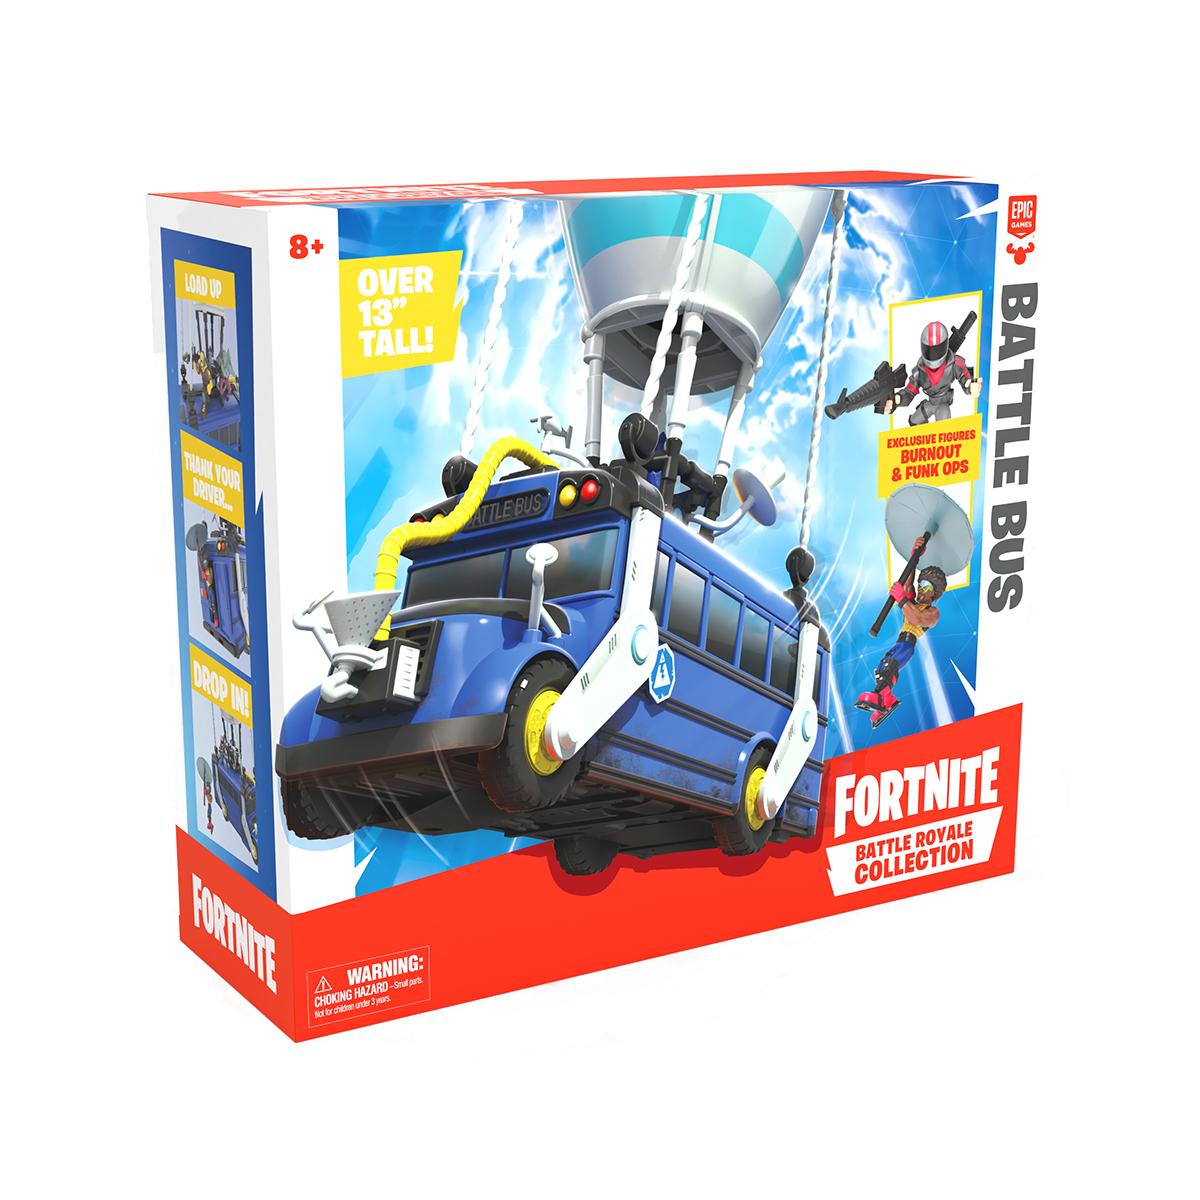 Set 2 figurine Fortnite, Burnout si Funk Ops, Battle Bus